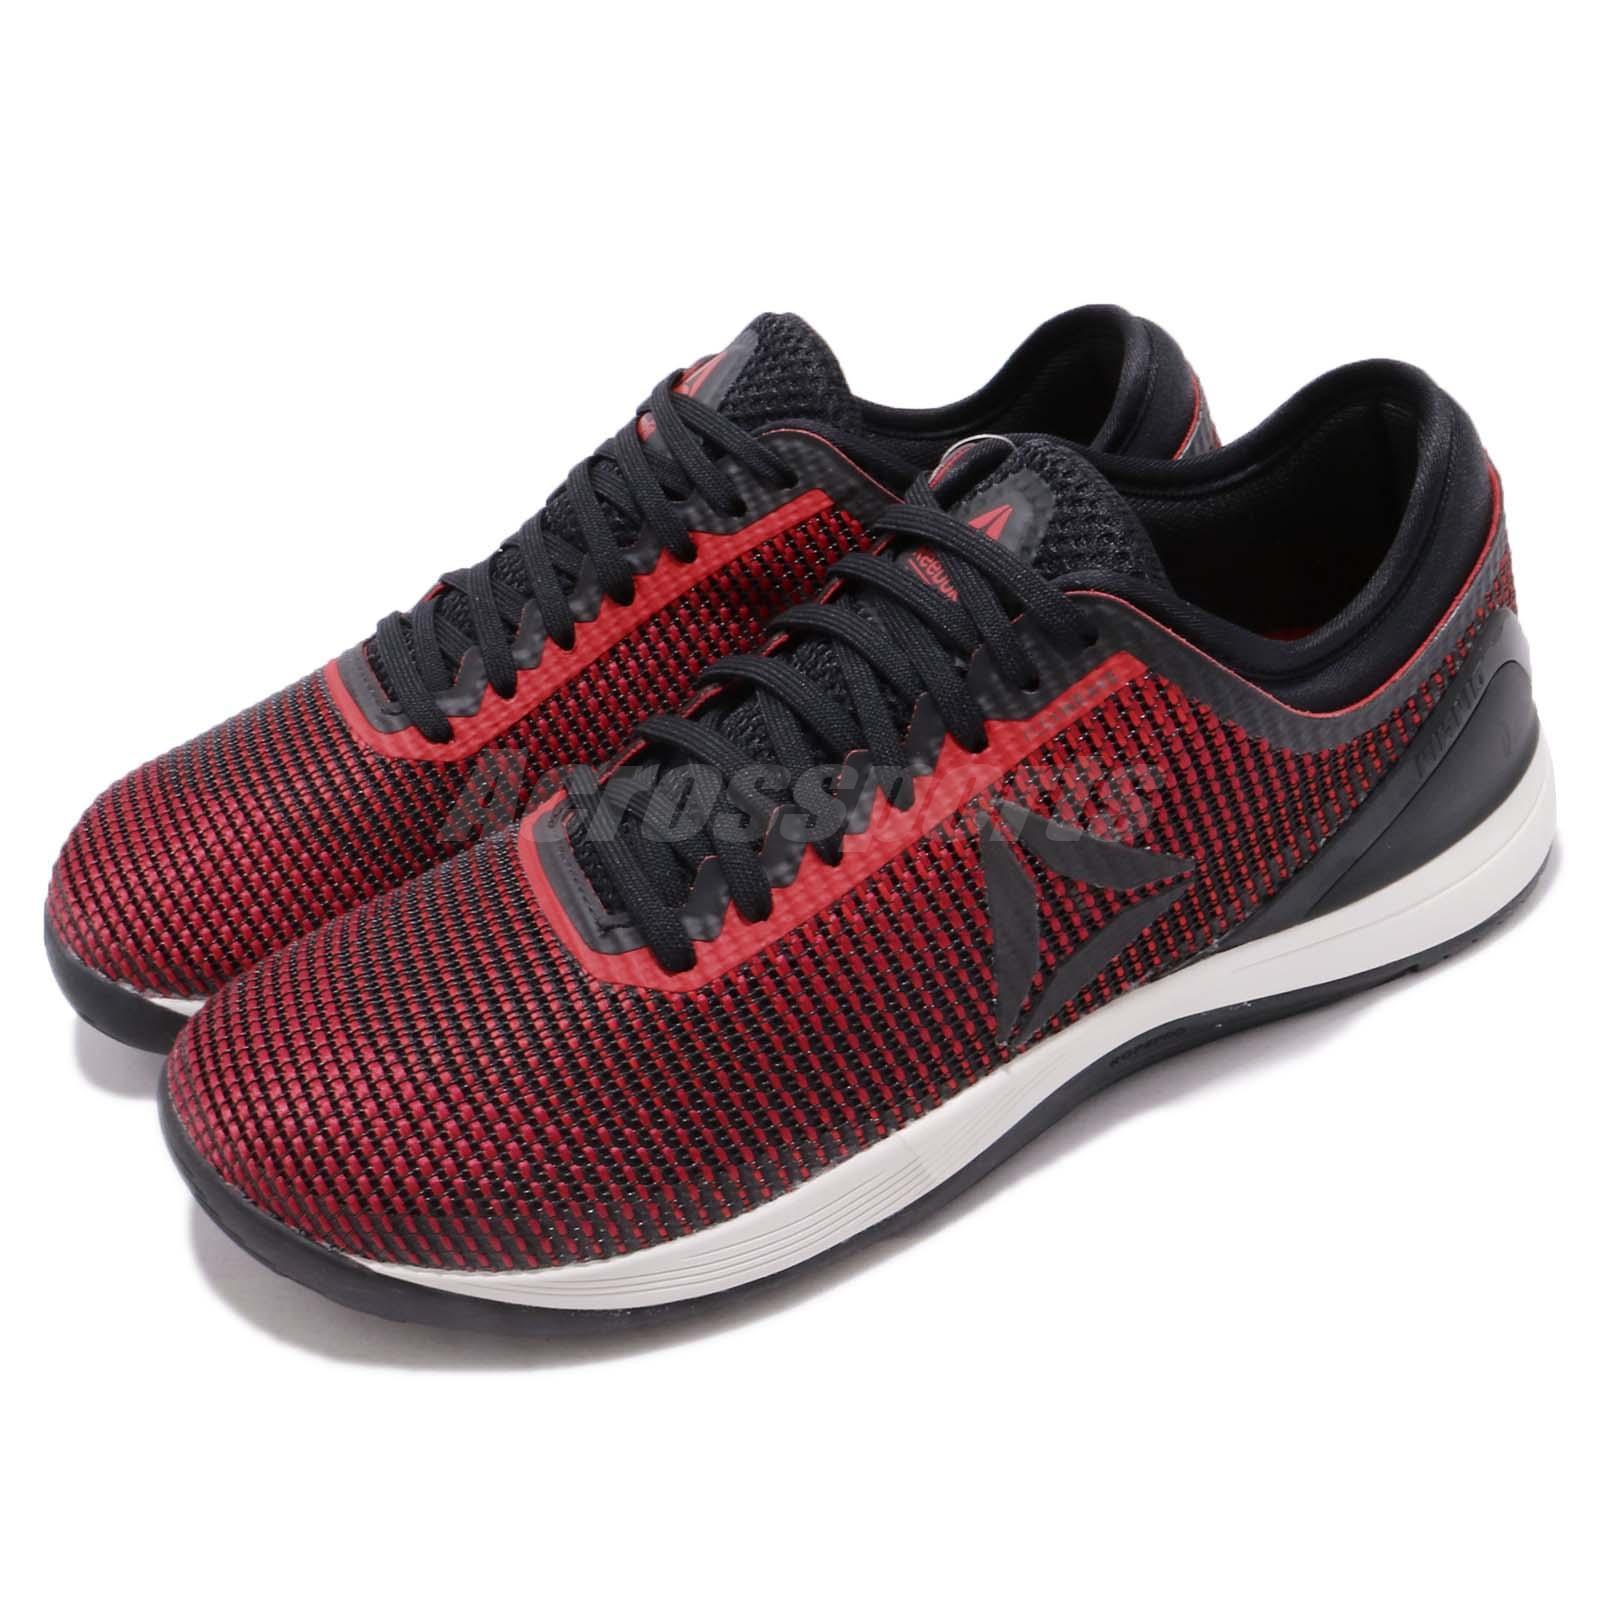 4f22ee3e1a2c70 Details about Reebok R CrossFit Nano 8.0 Black Red Chalk Men Cross Training  Shoes CN5656